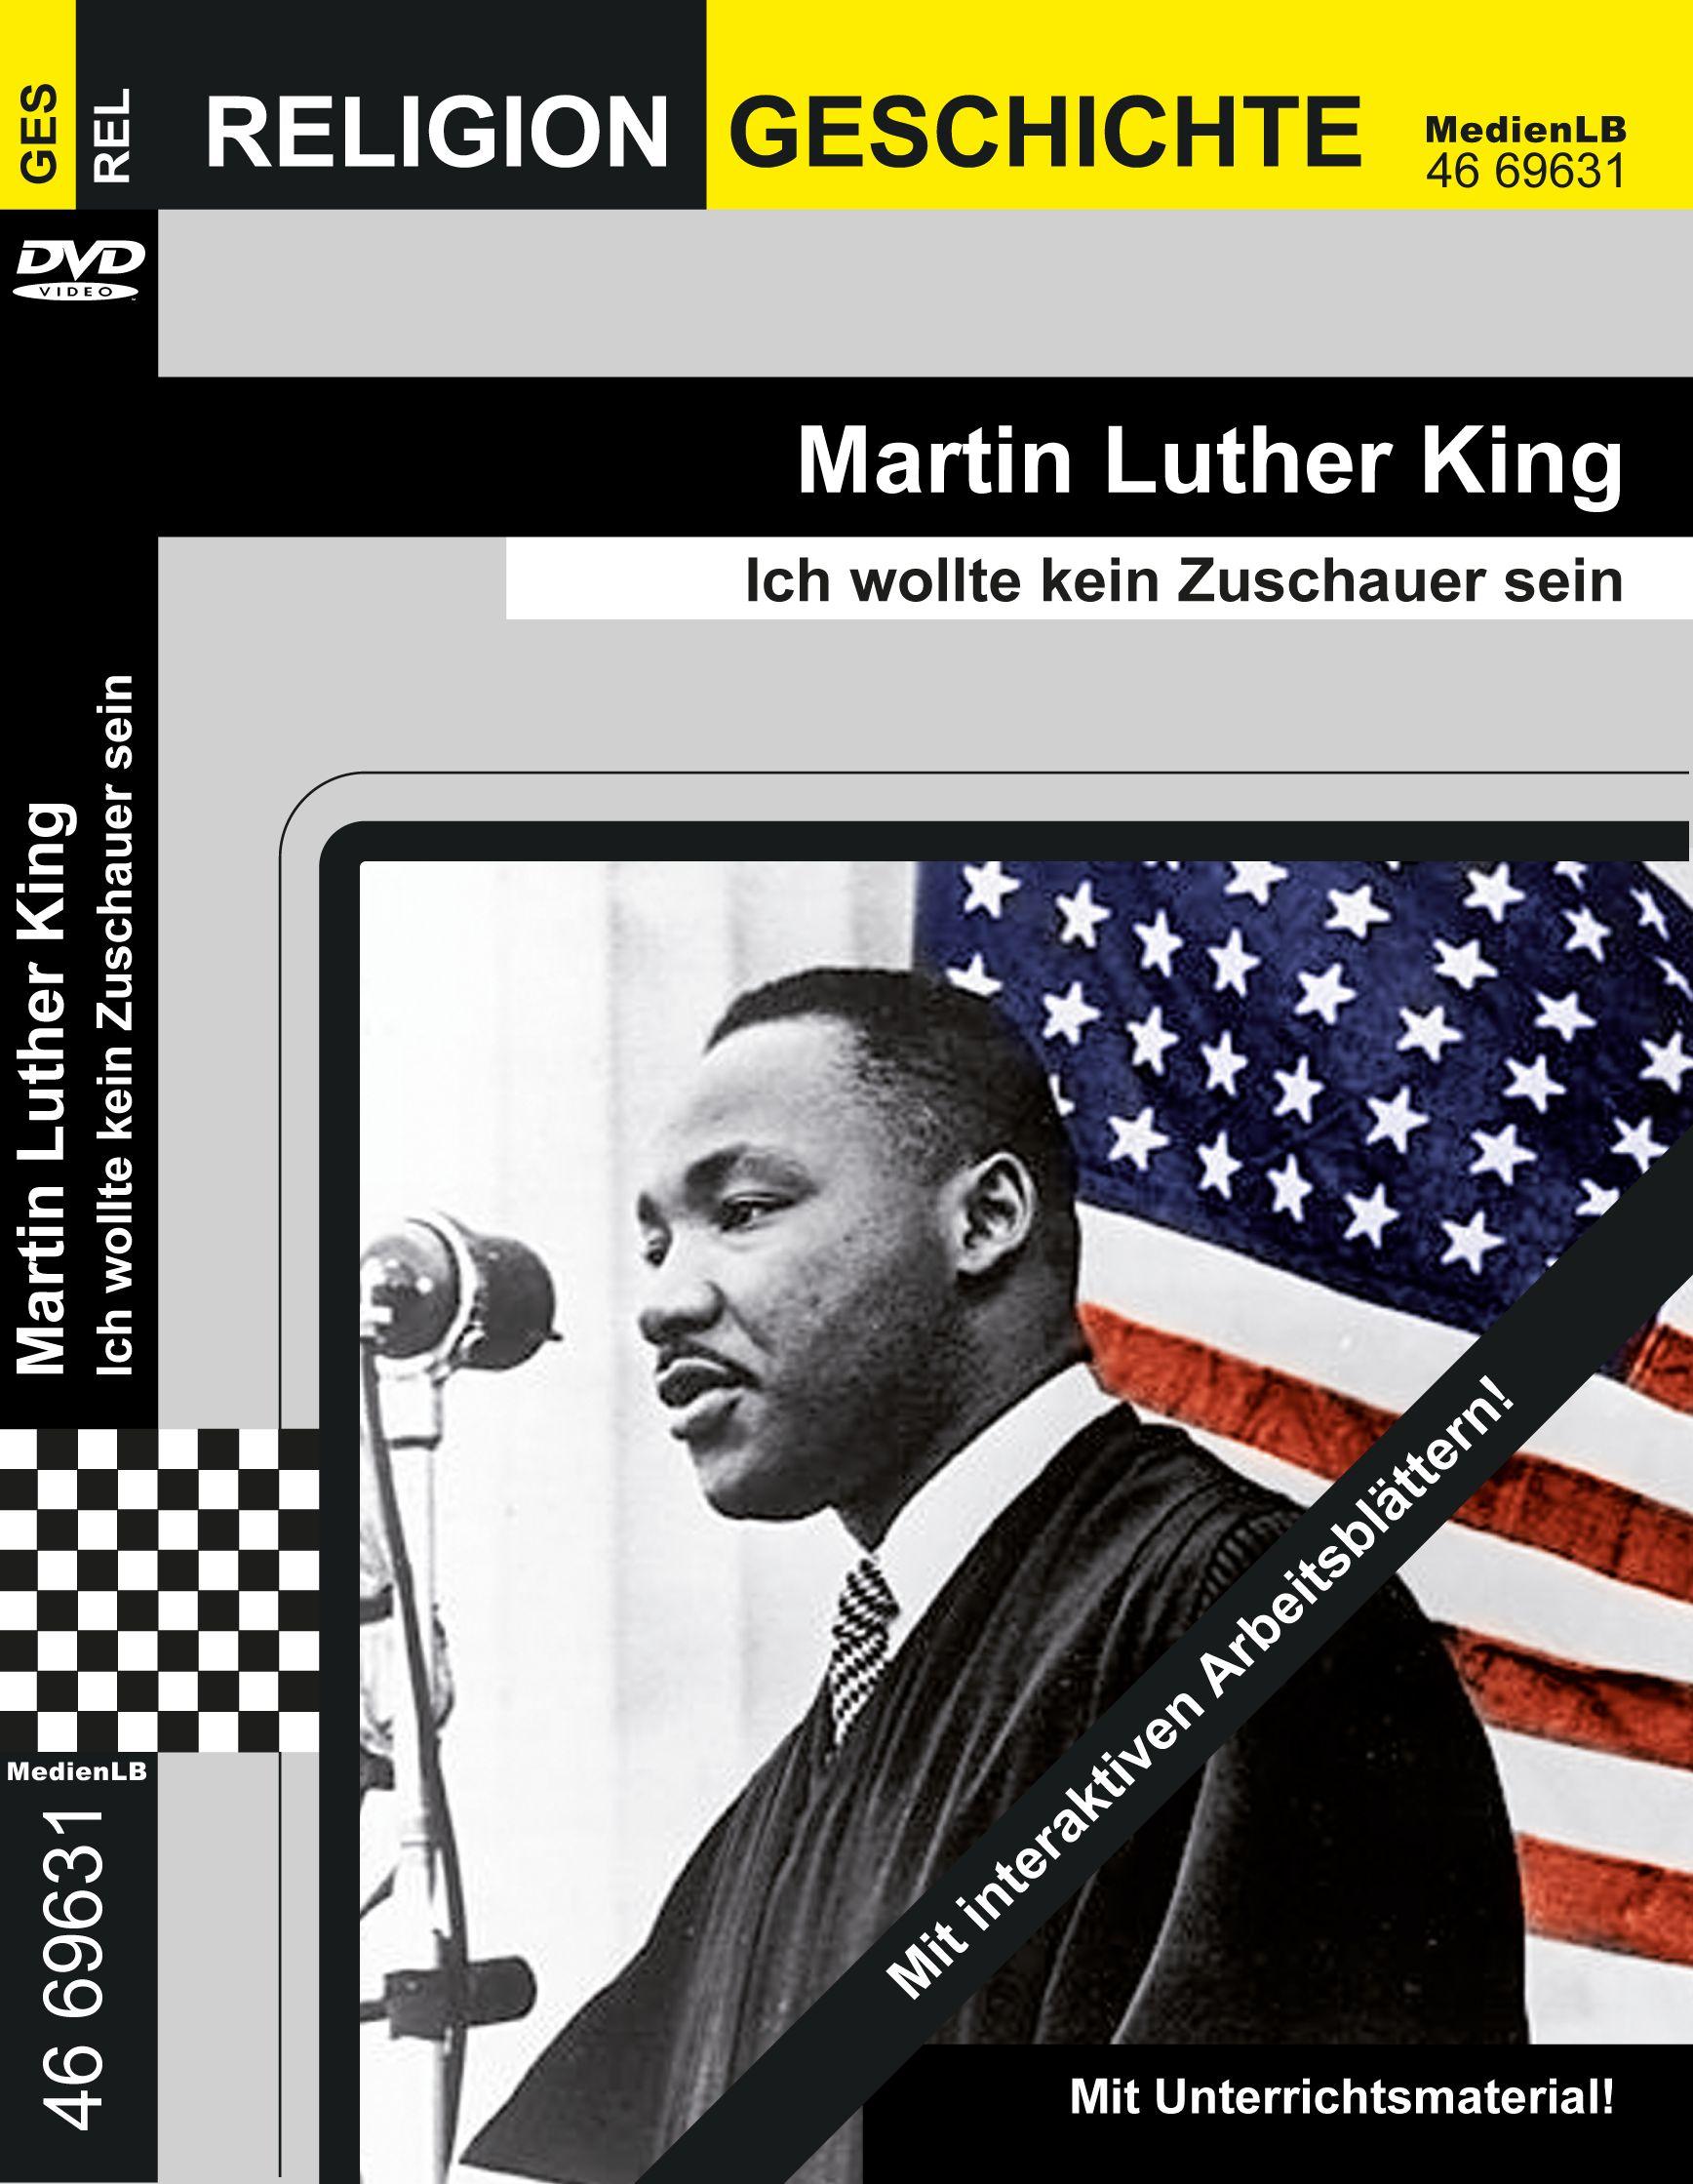 Martin Luther King - DVD - MedienLB Englisch